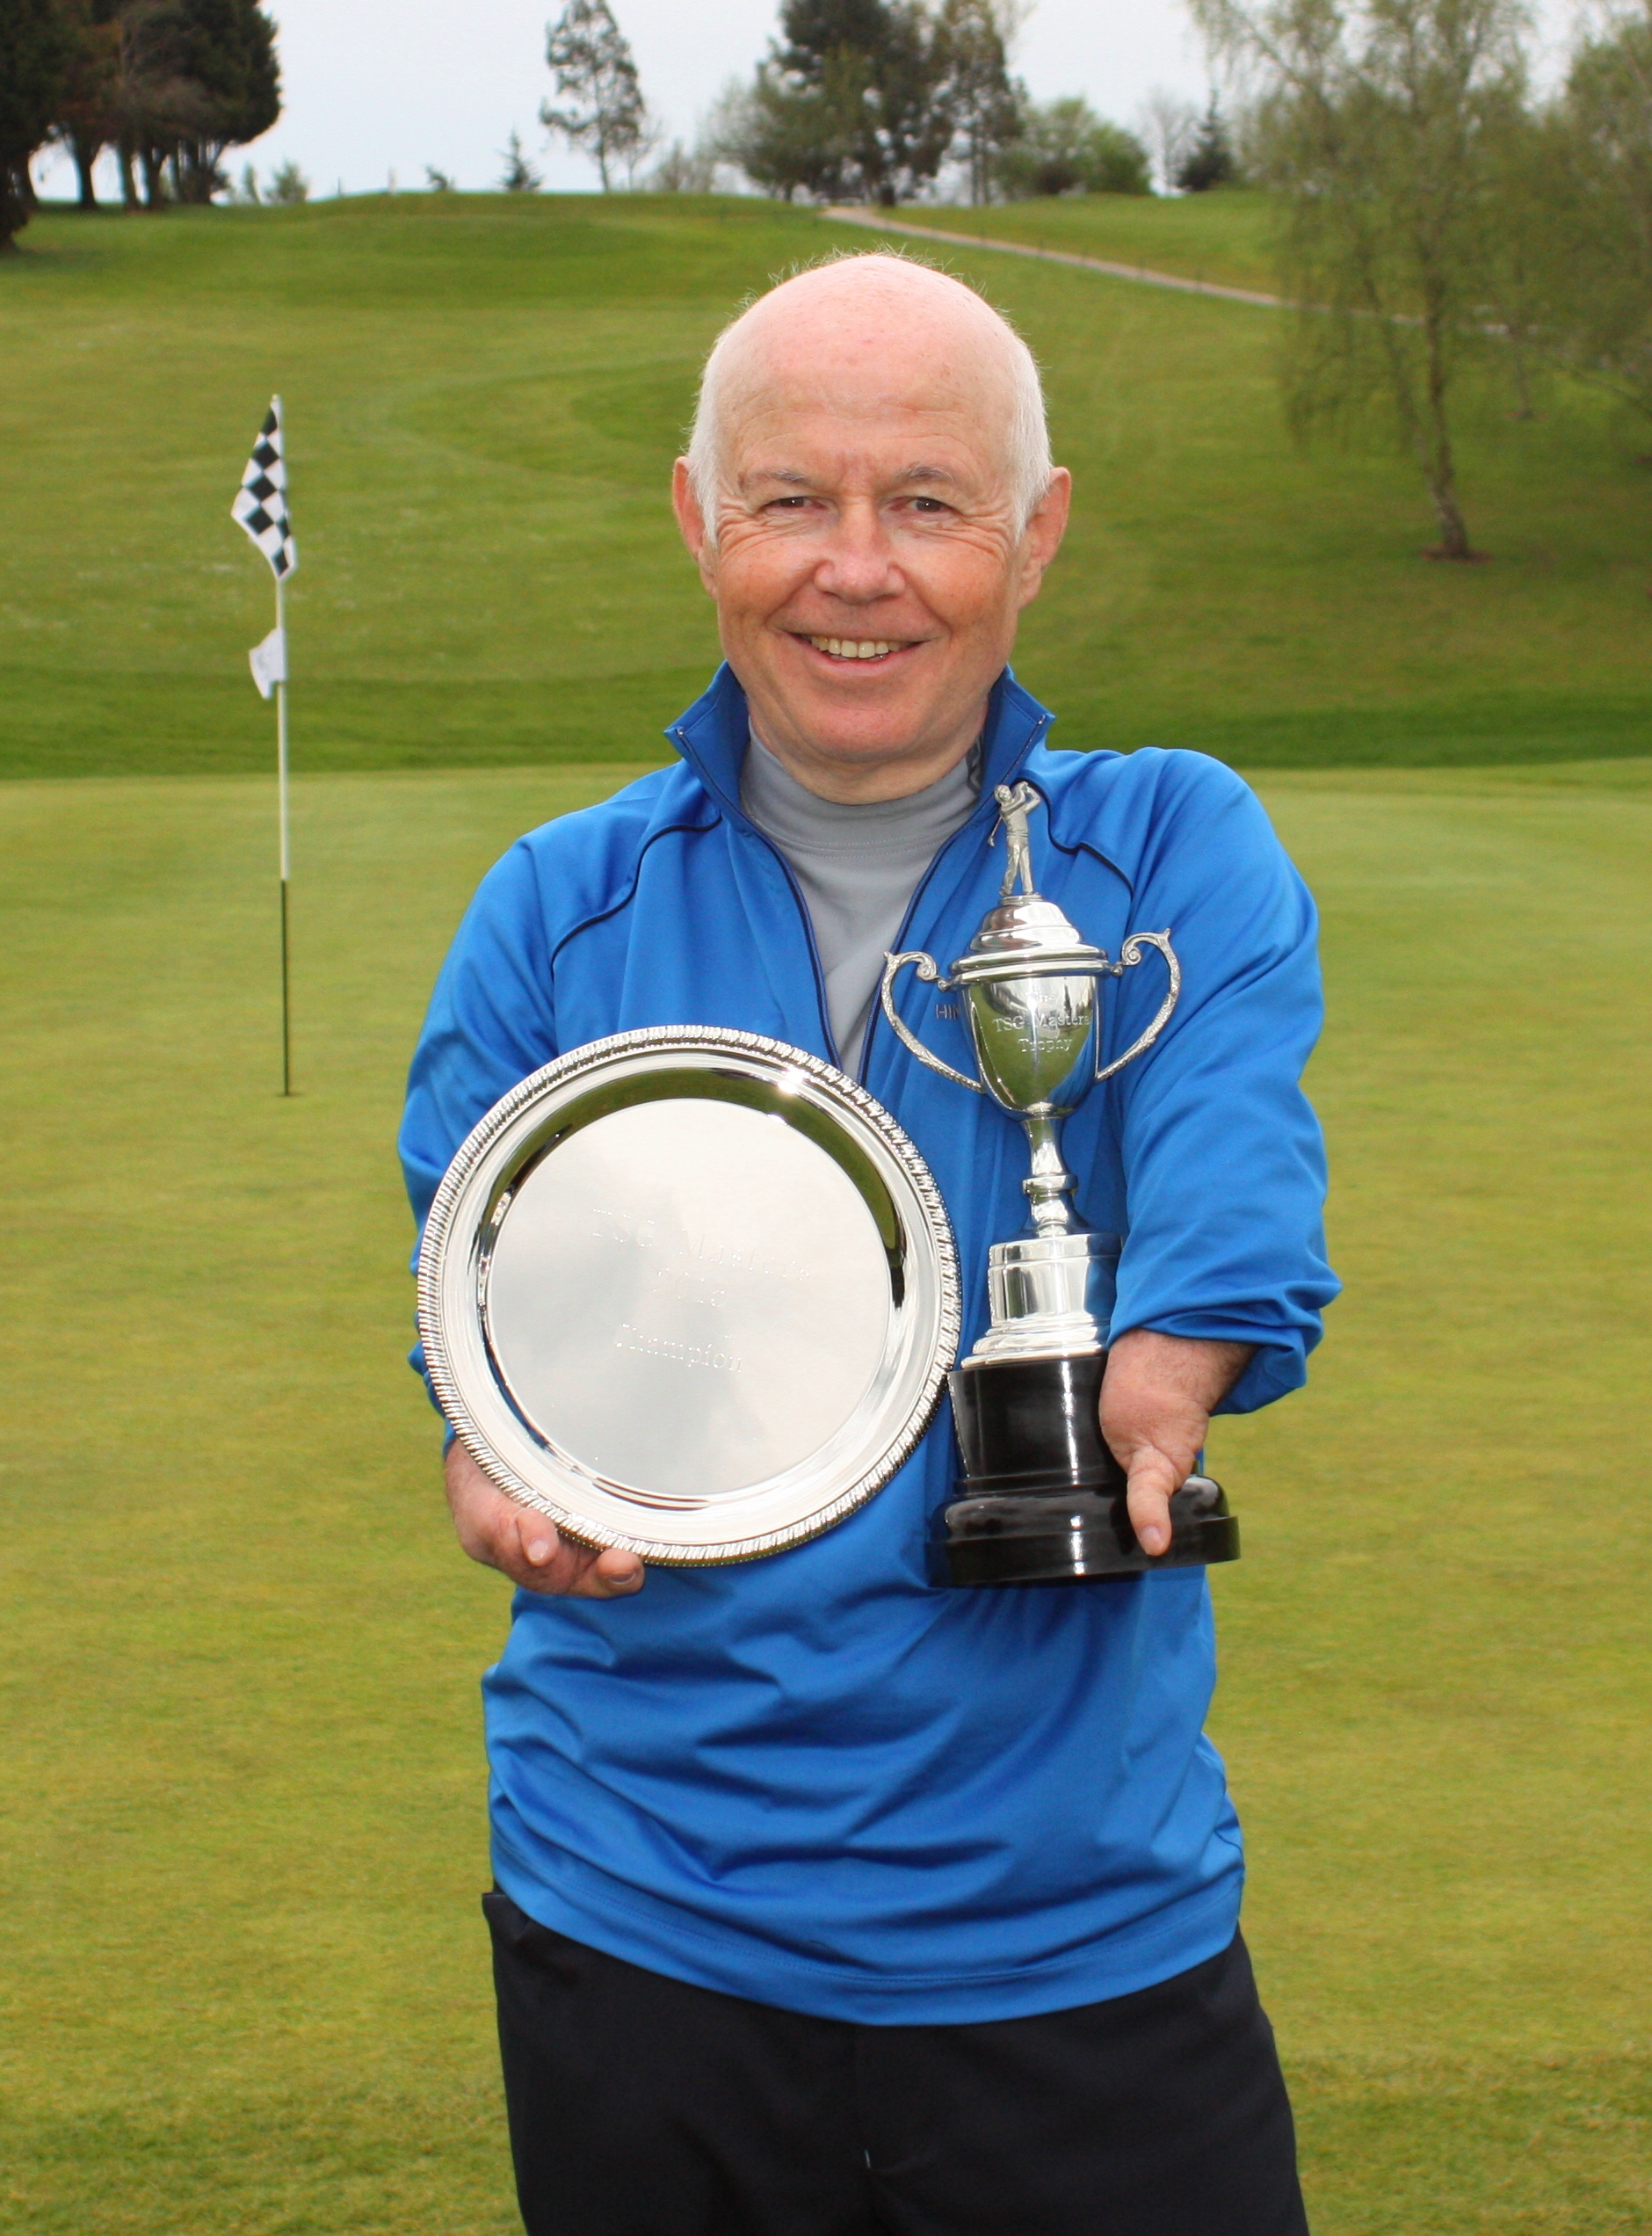 Disabled golfer wins TSG Masters at Warley Park, Essex - Richard Saunders